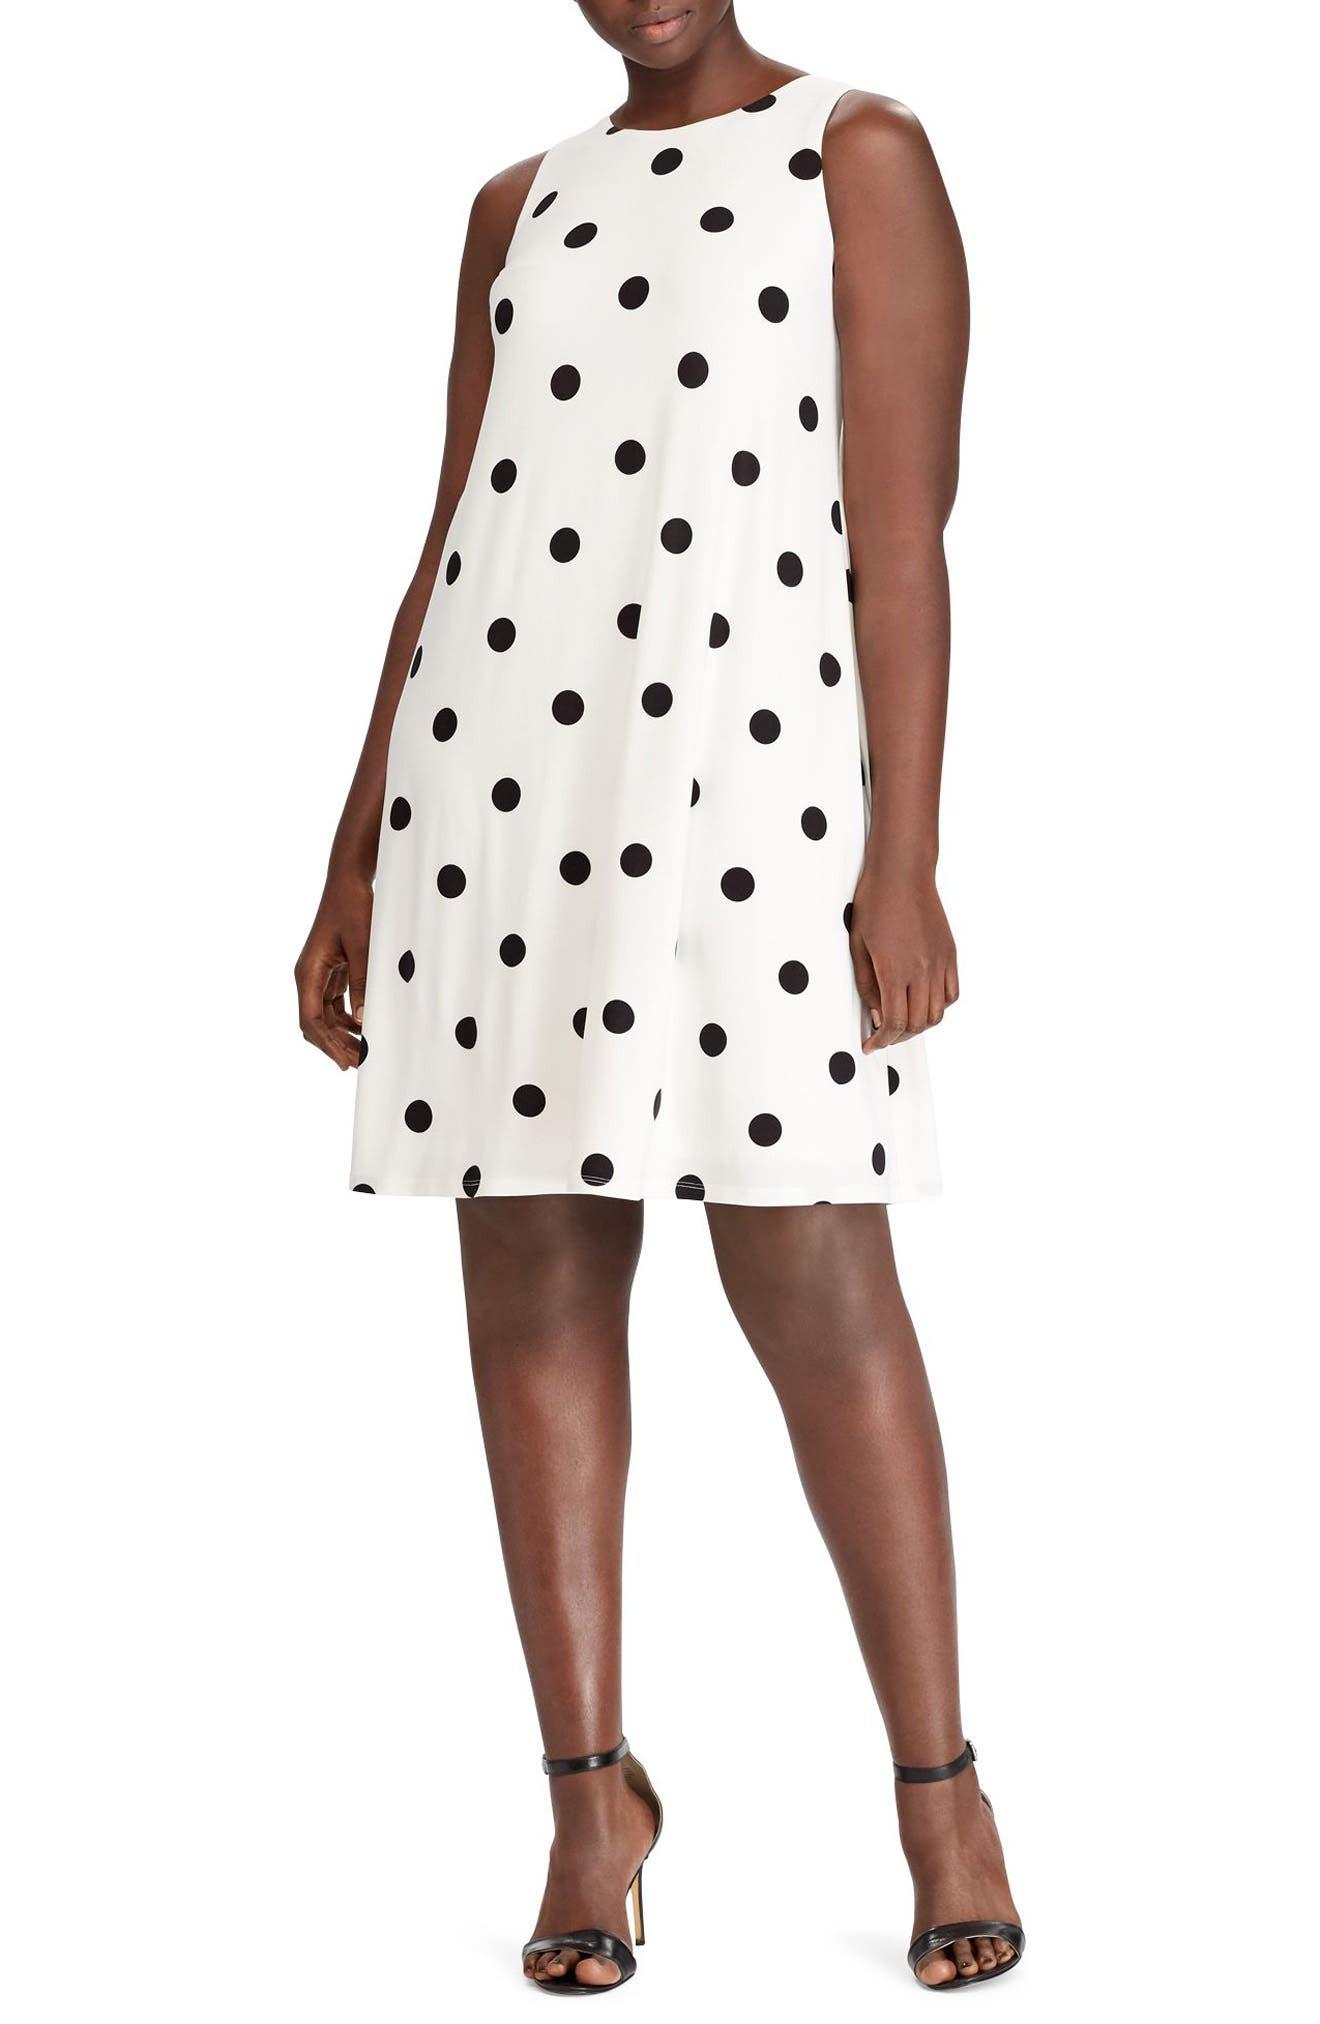 Peninsula Dot A-Line Dress,                         Main,                         color, 101